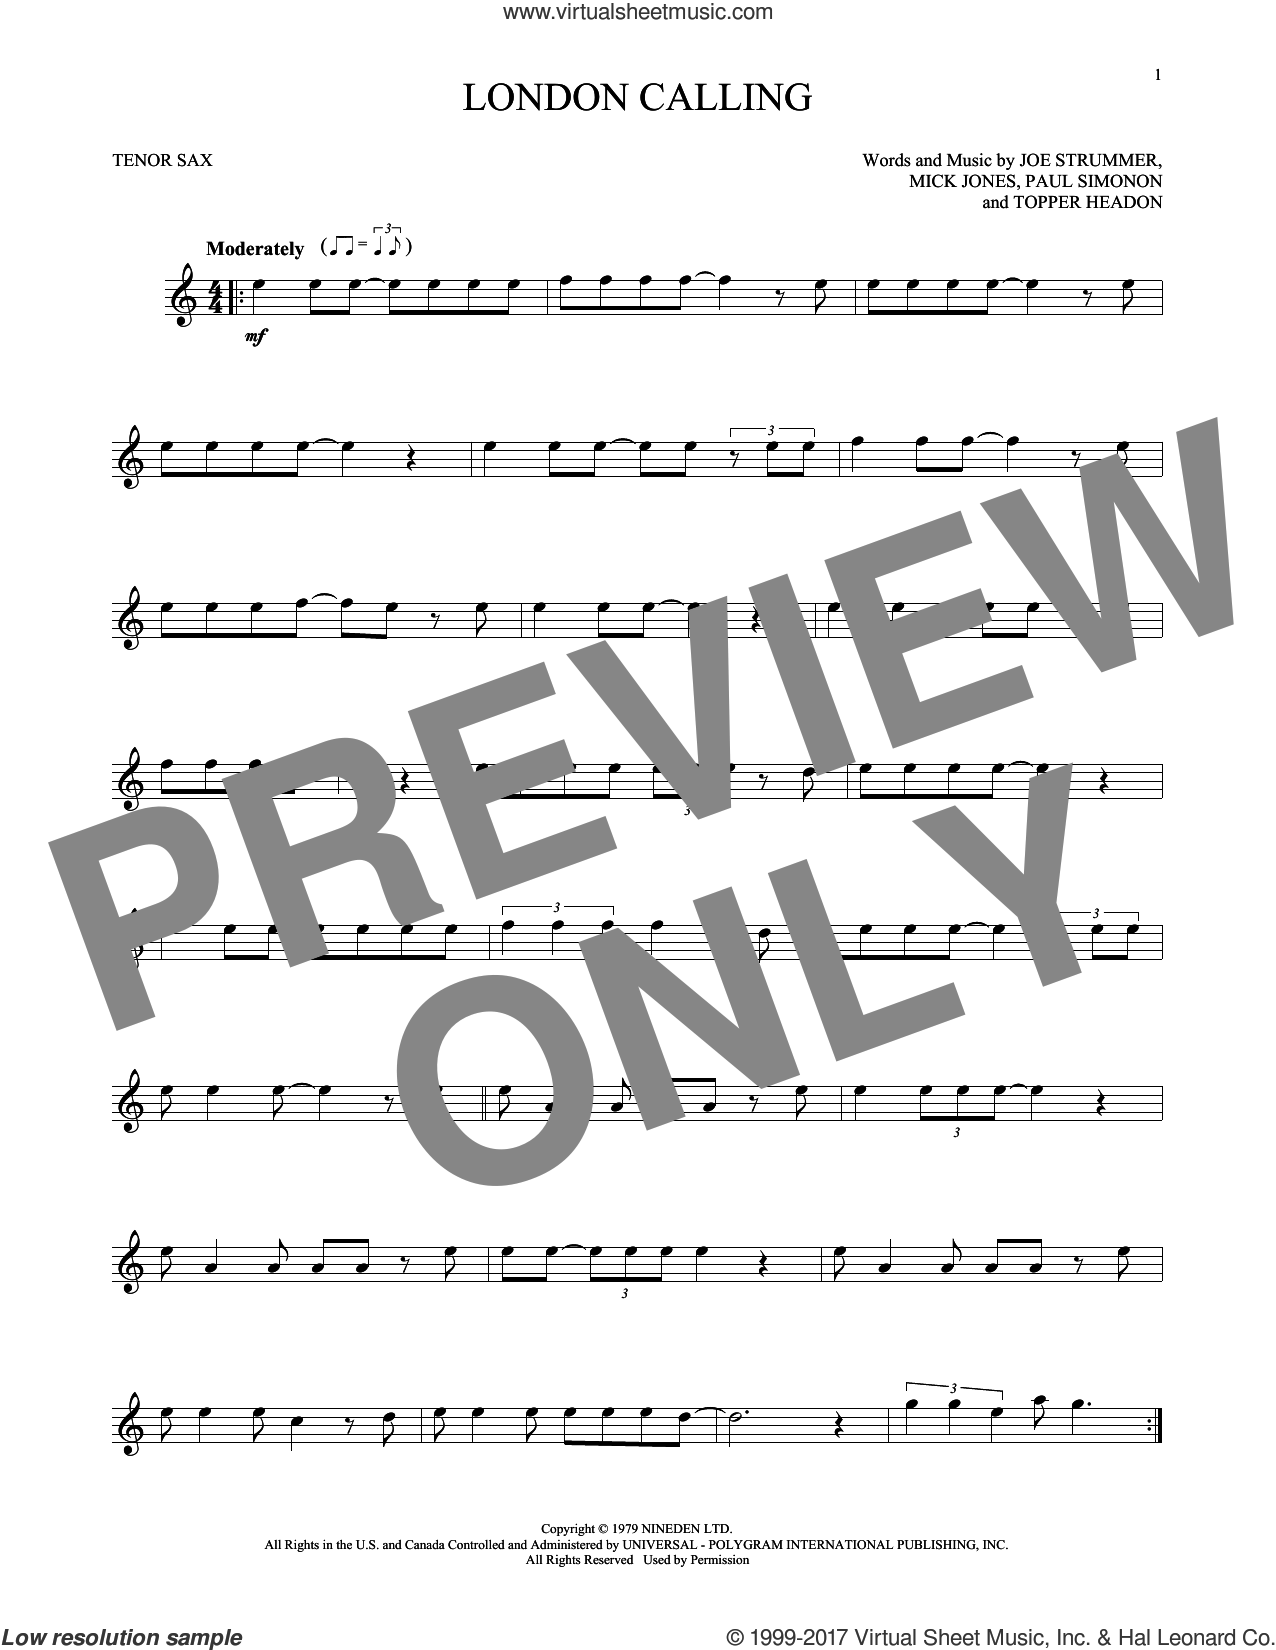 London Calling sheet music for tenor saxophone solo by The Clash, Joe Strummer, Mick Jones, Paul Simonon and Topper Headon, intermediate skill level